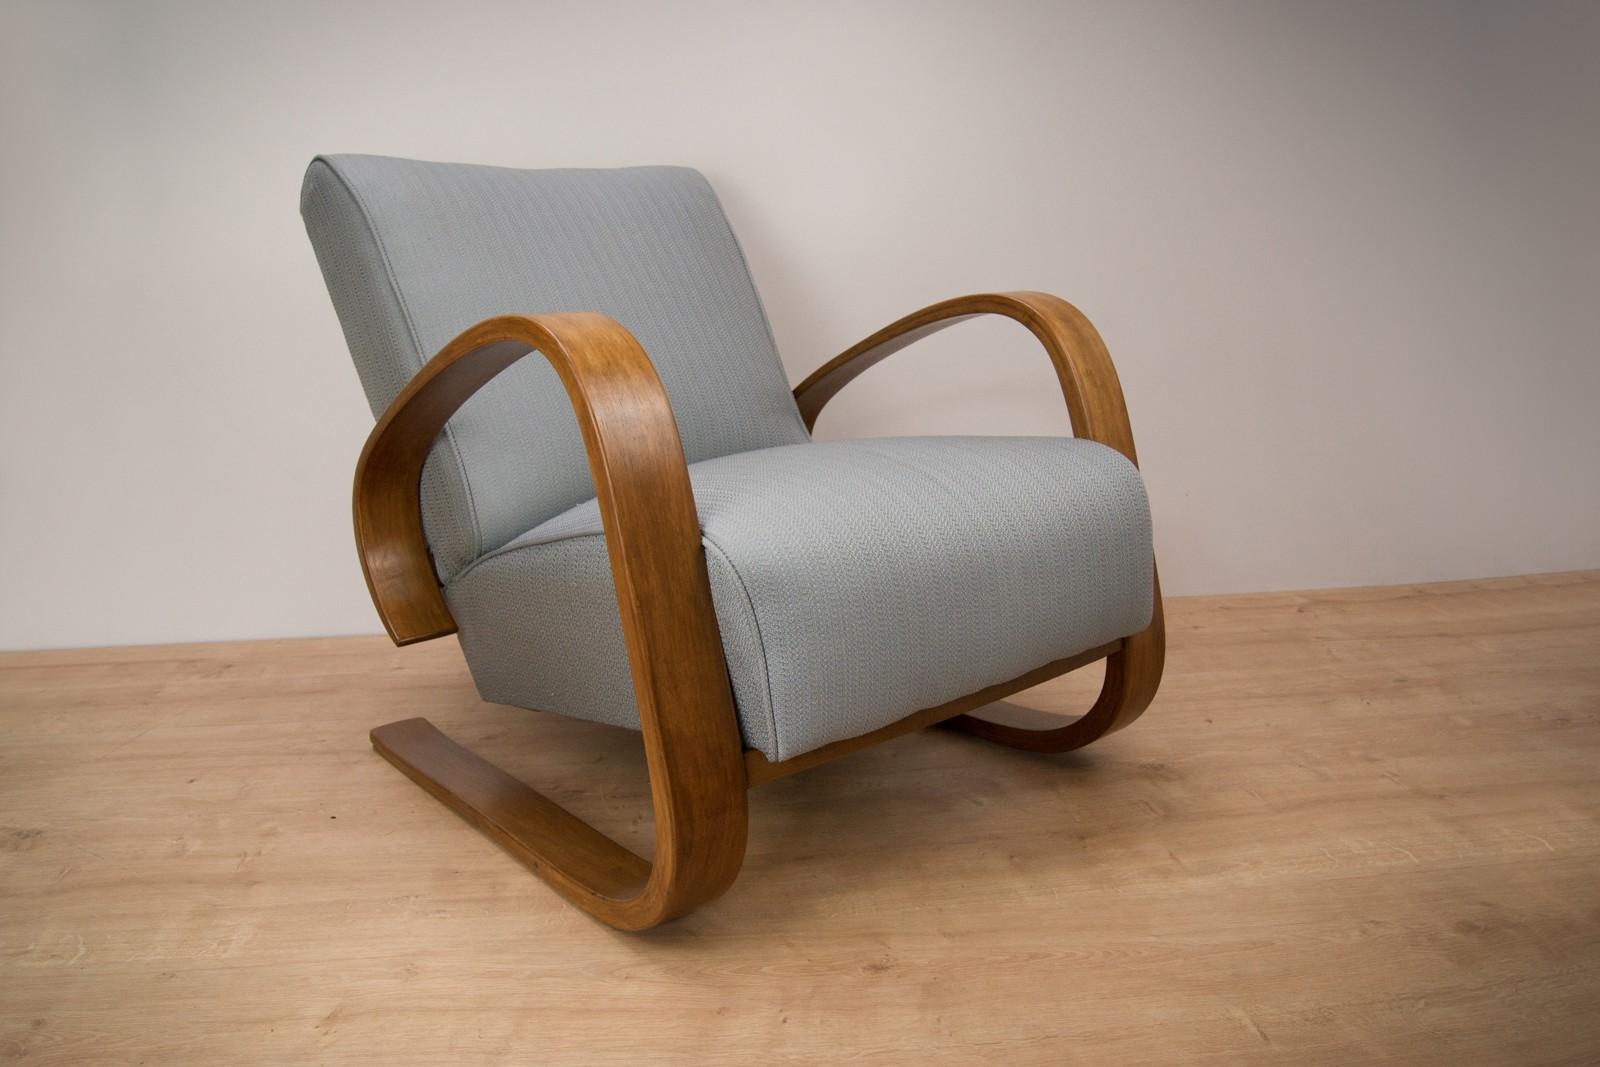 vintage-model-400-tank-armchair-by-alvar-aalto-for-artek-1950s1